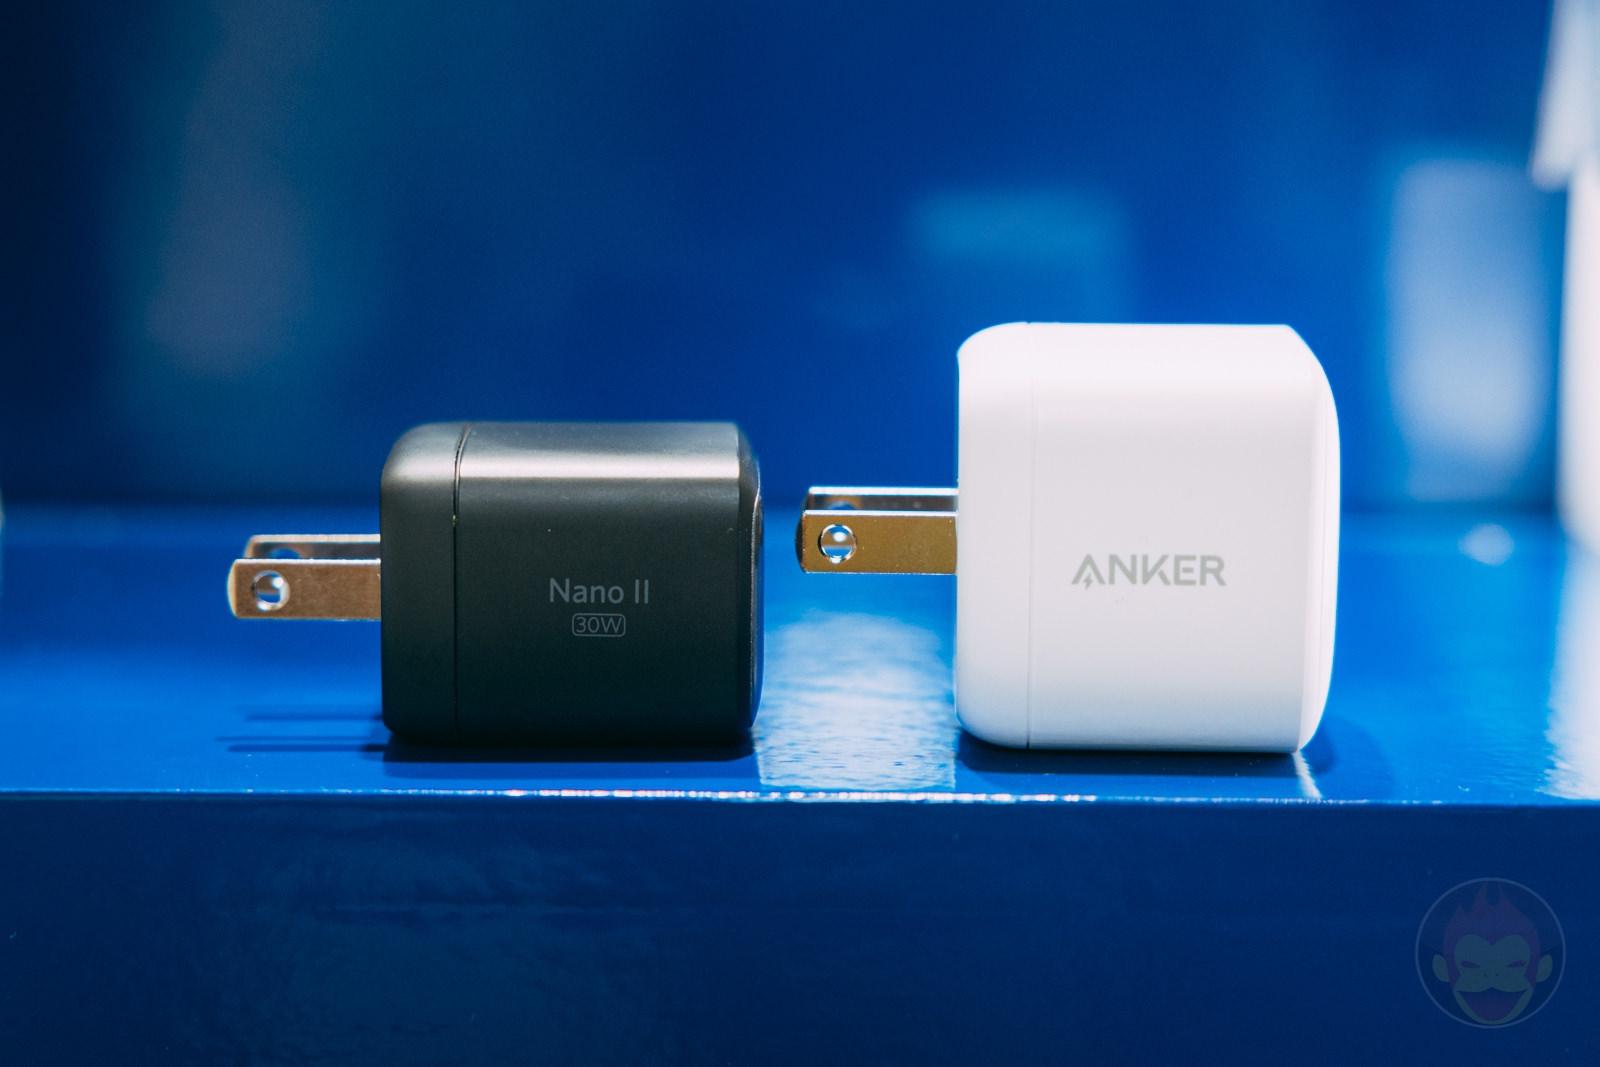 Anker GAN II Nano Series Hands On 12